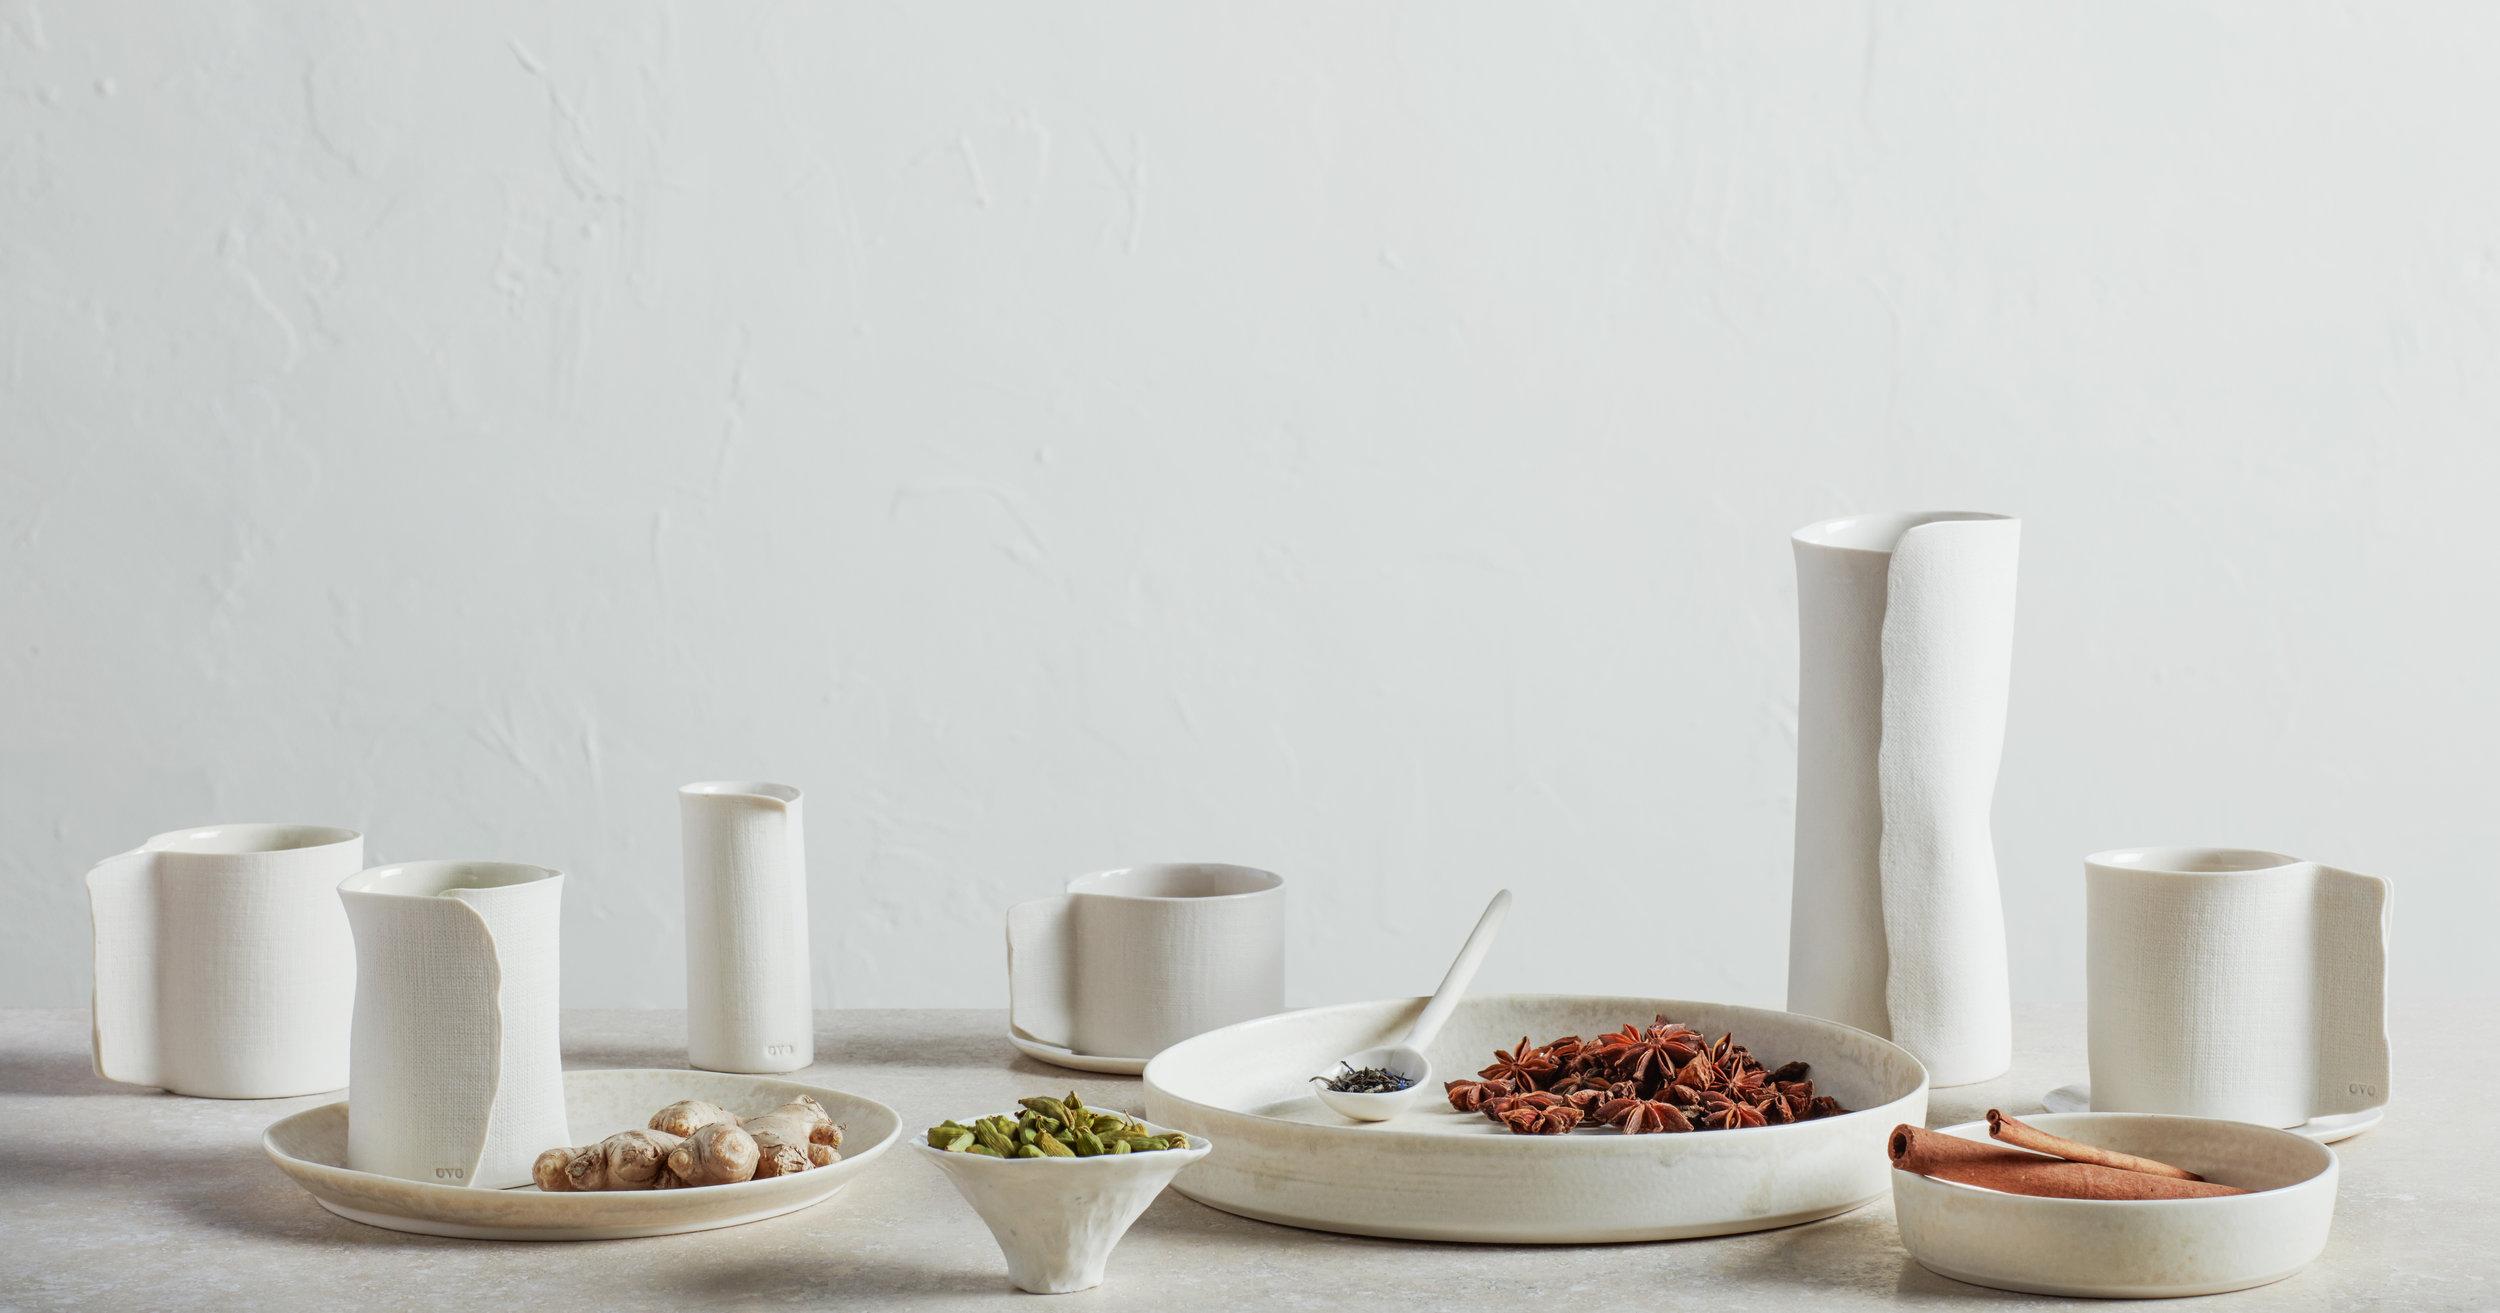 bt_banner_kitchen-and-tabletop_0330.jpg